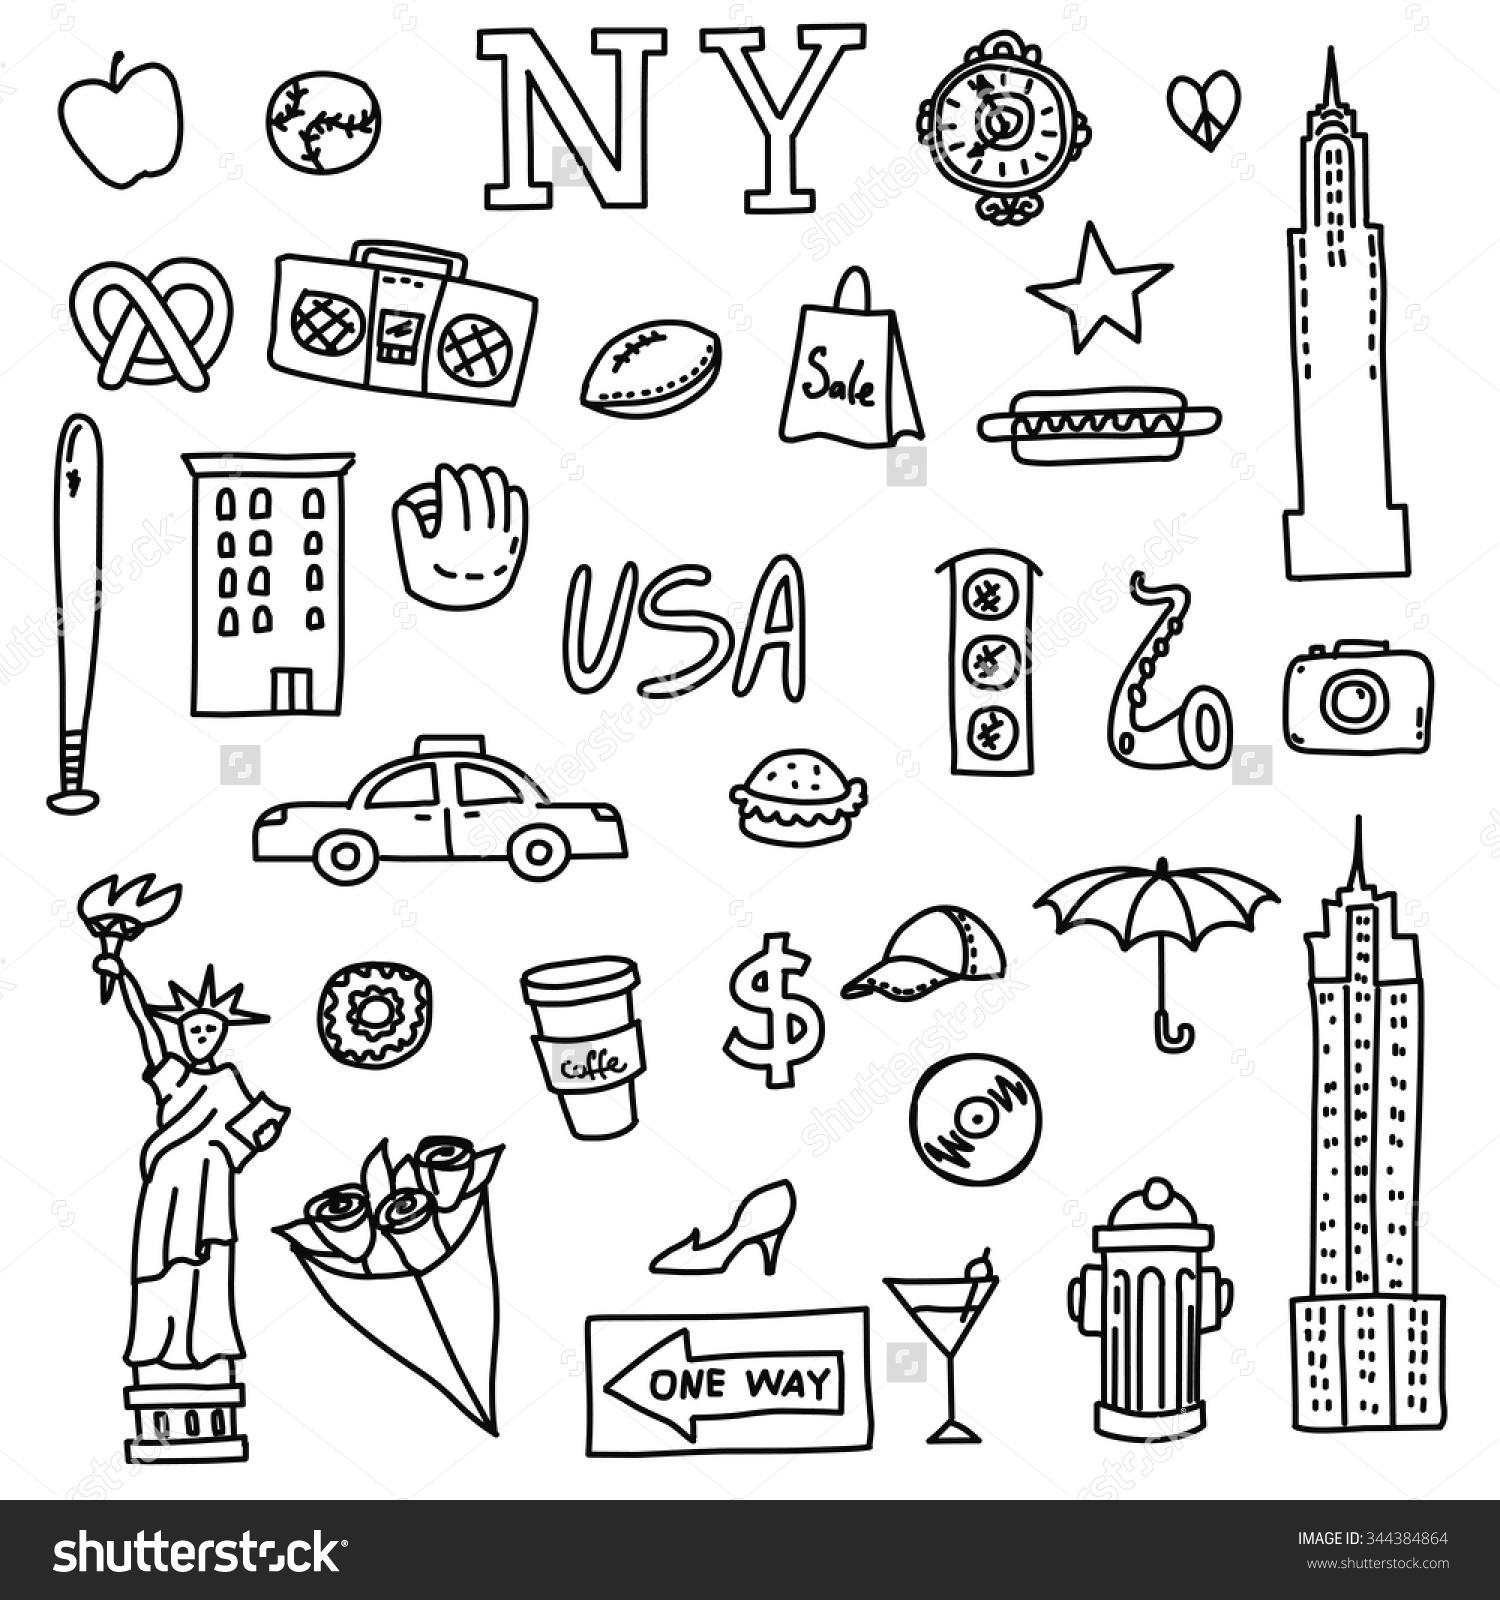 1500x1600 New York Symbols Images